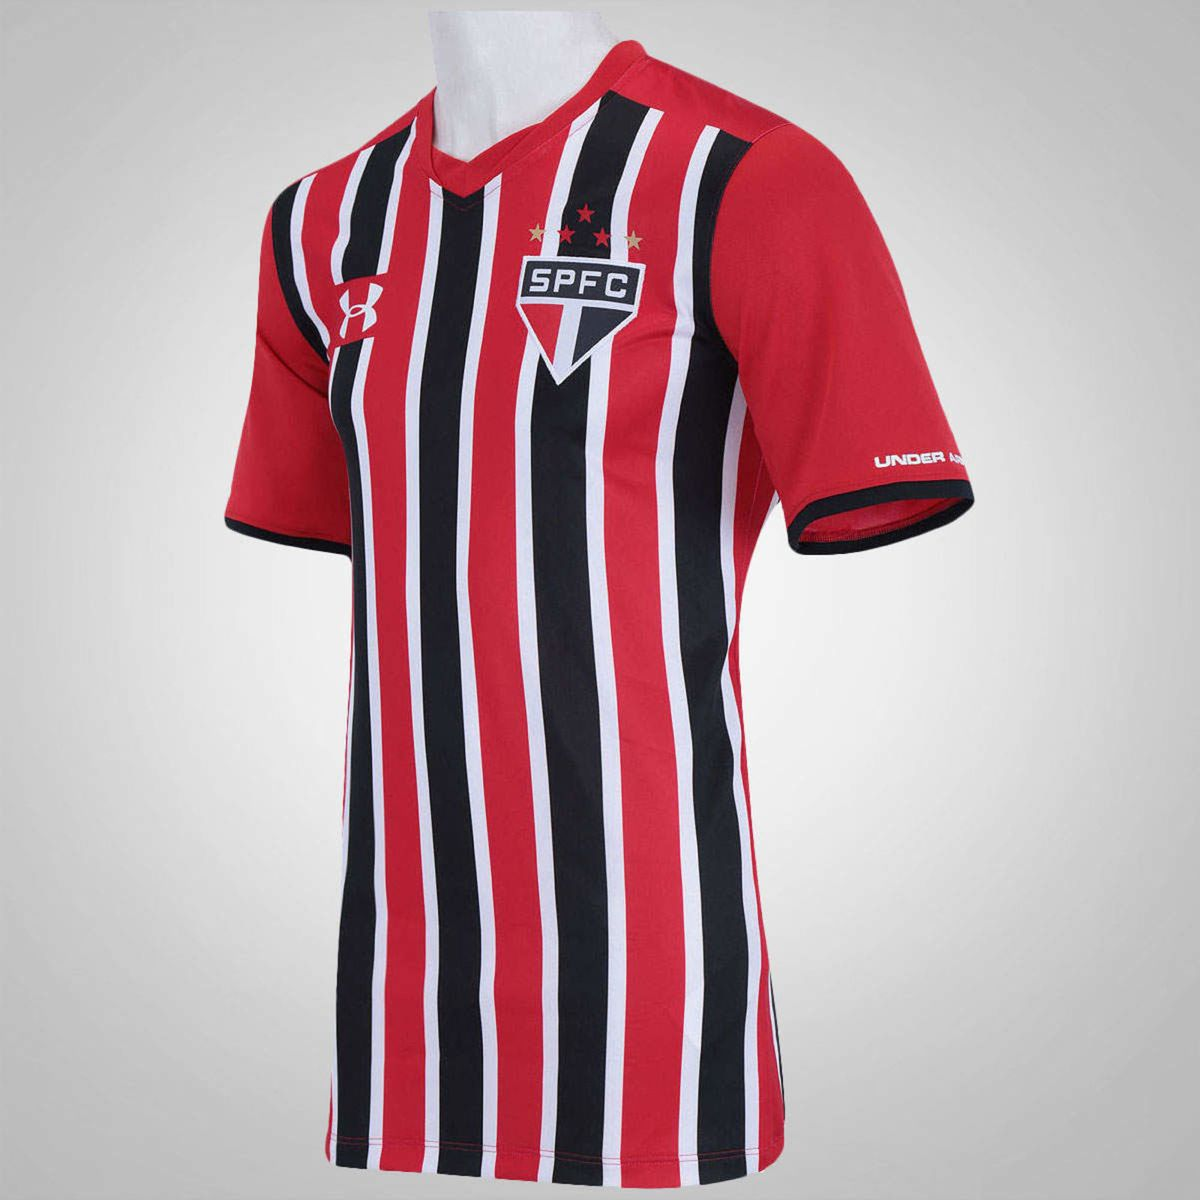 0ec2d0102f7 camisa spfc nova - esportes under armour.  Czm6ly9wag90b3muzw5qb2vplmnvbs5ici9wcm9kdwn0cy82otixotu4lzdjyty5ytyxotbmytywodezzmzlndnlyzu5yjfhmtkwlmpwzw  ...